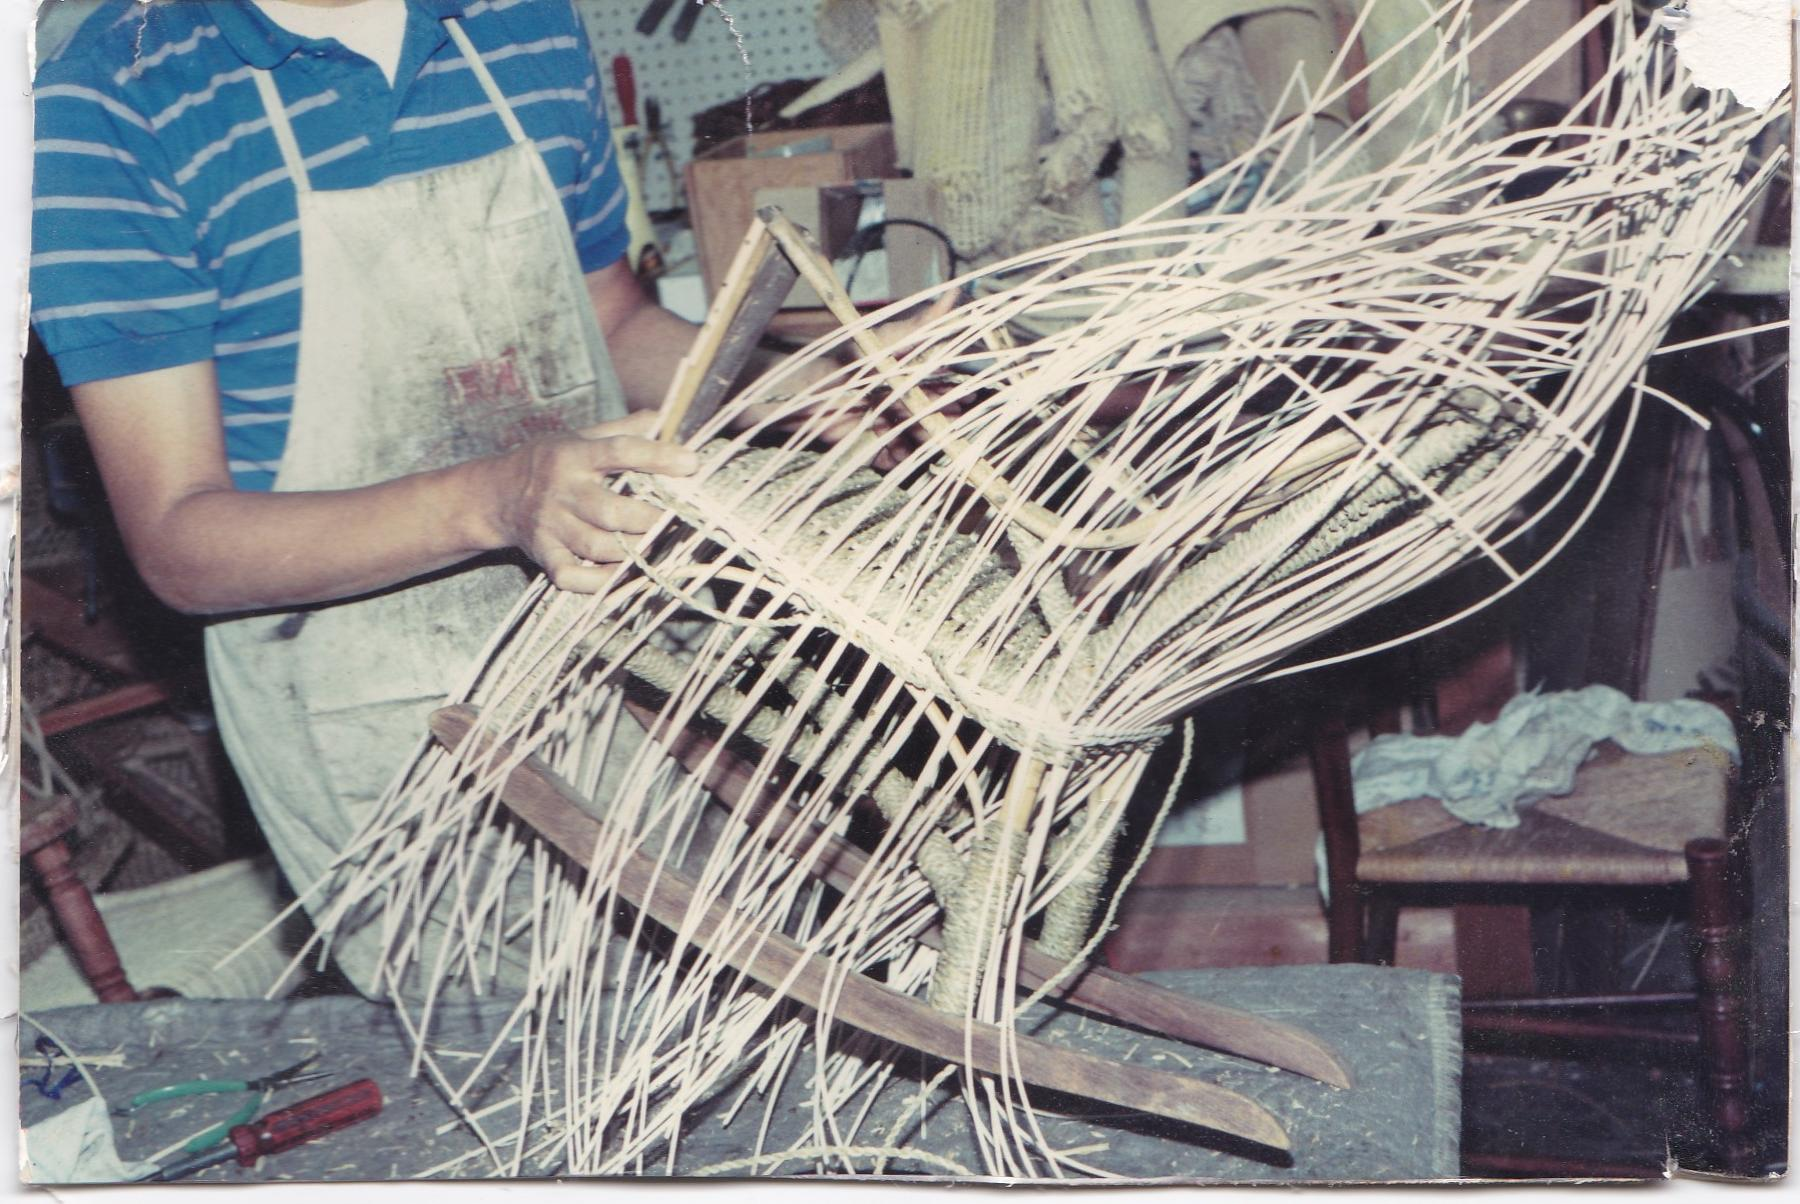 Lazo's Caning & Wicker image 7